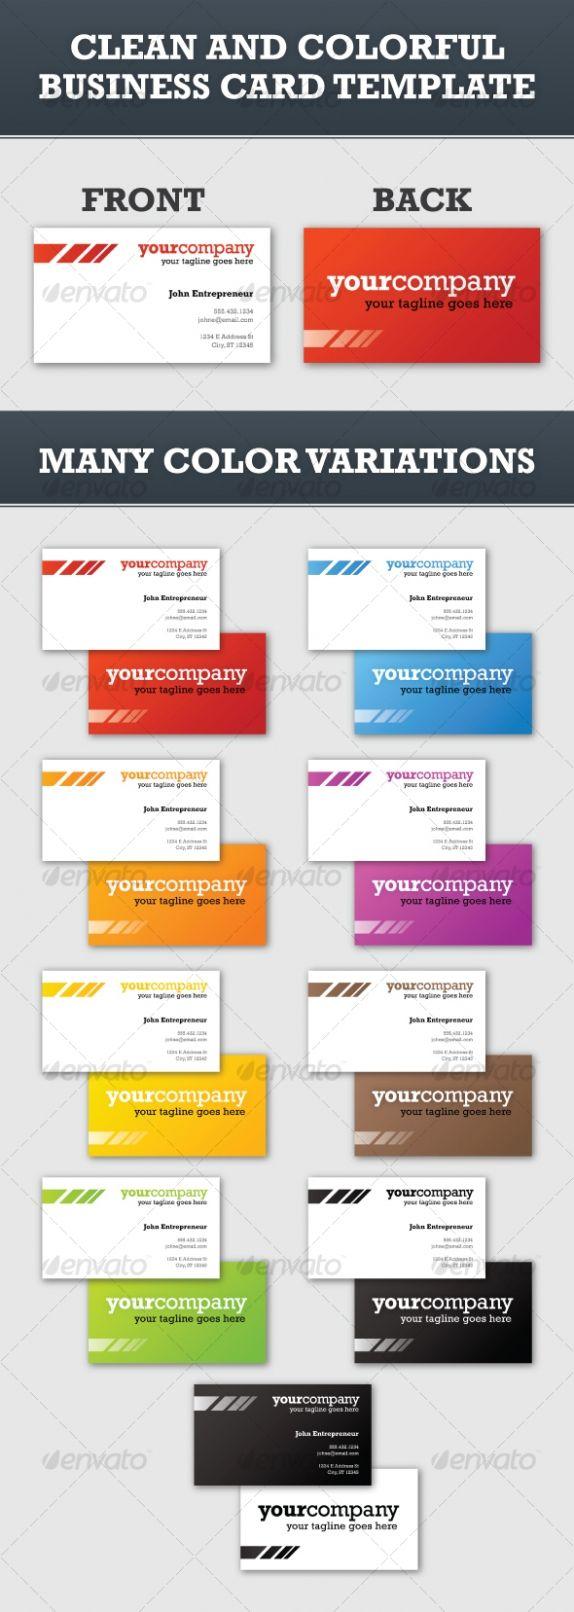 Business Card Design Templates | Cardview.net – Business Card & Visit Card Design Inspiration Gallery ...